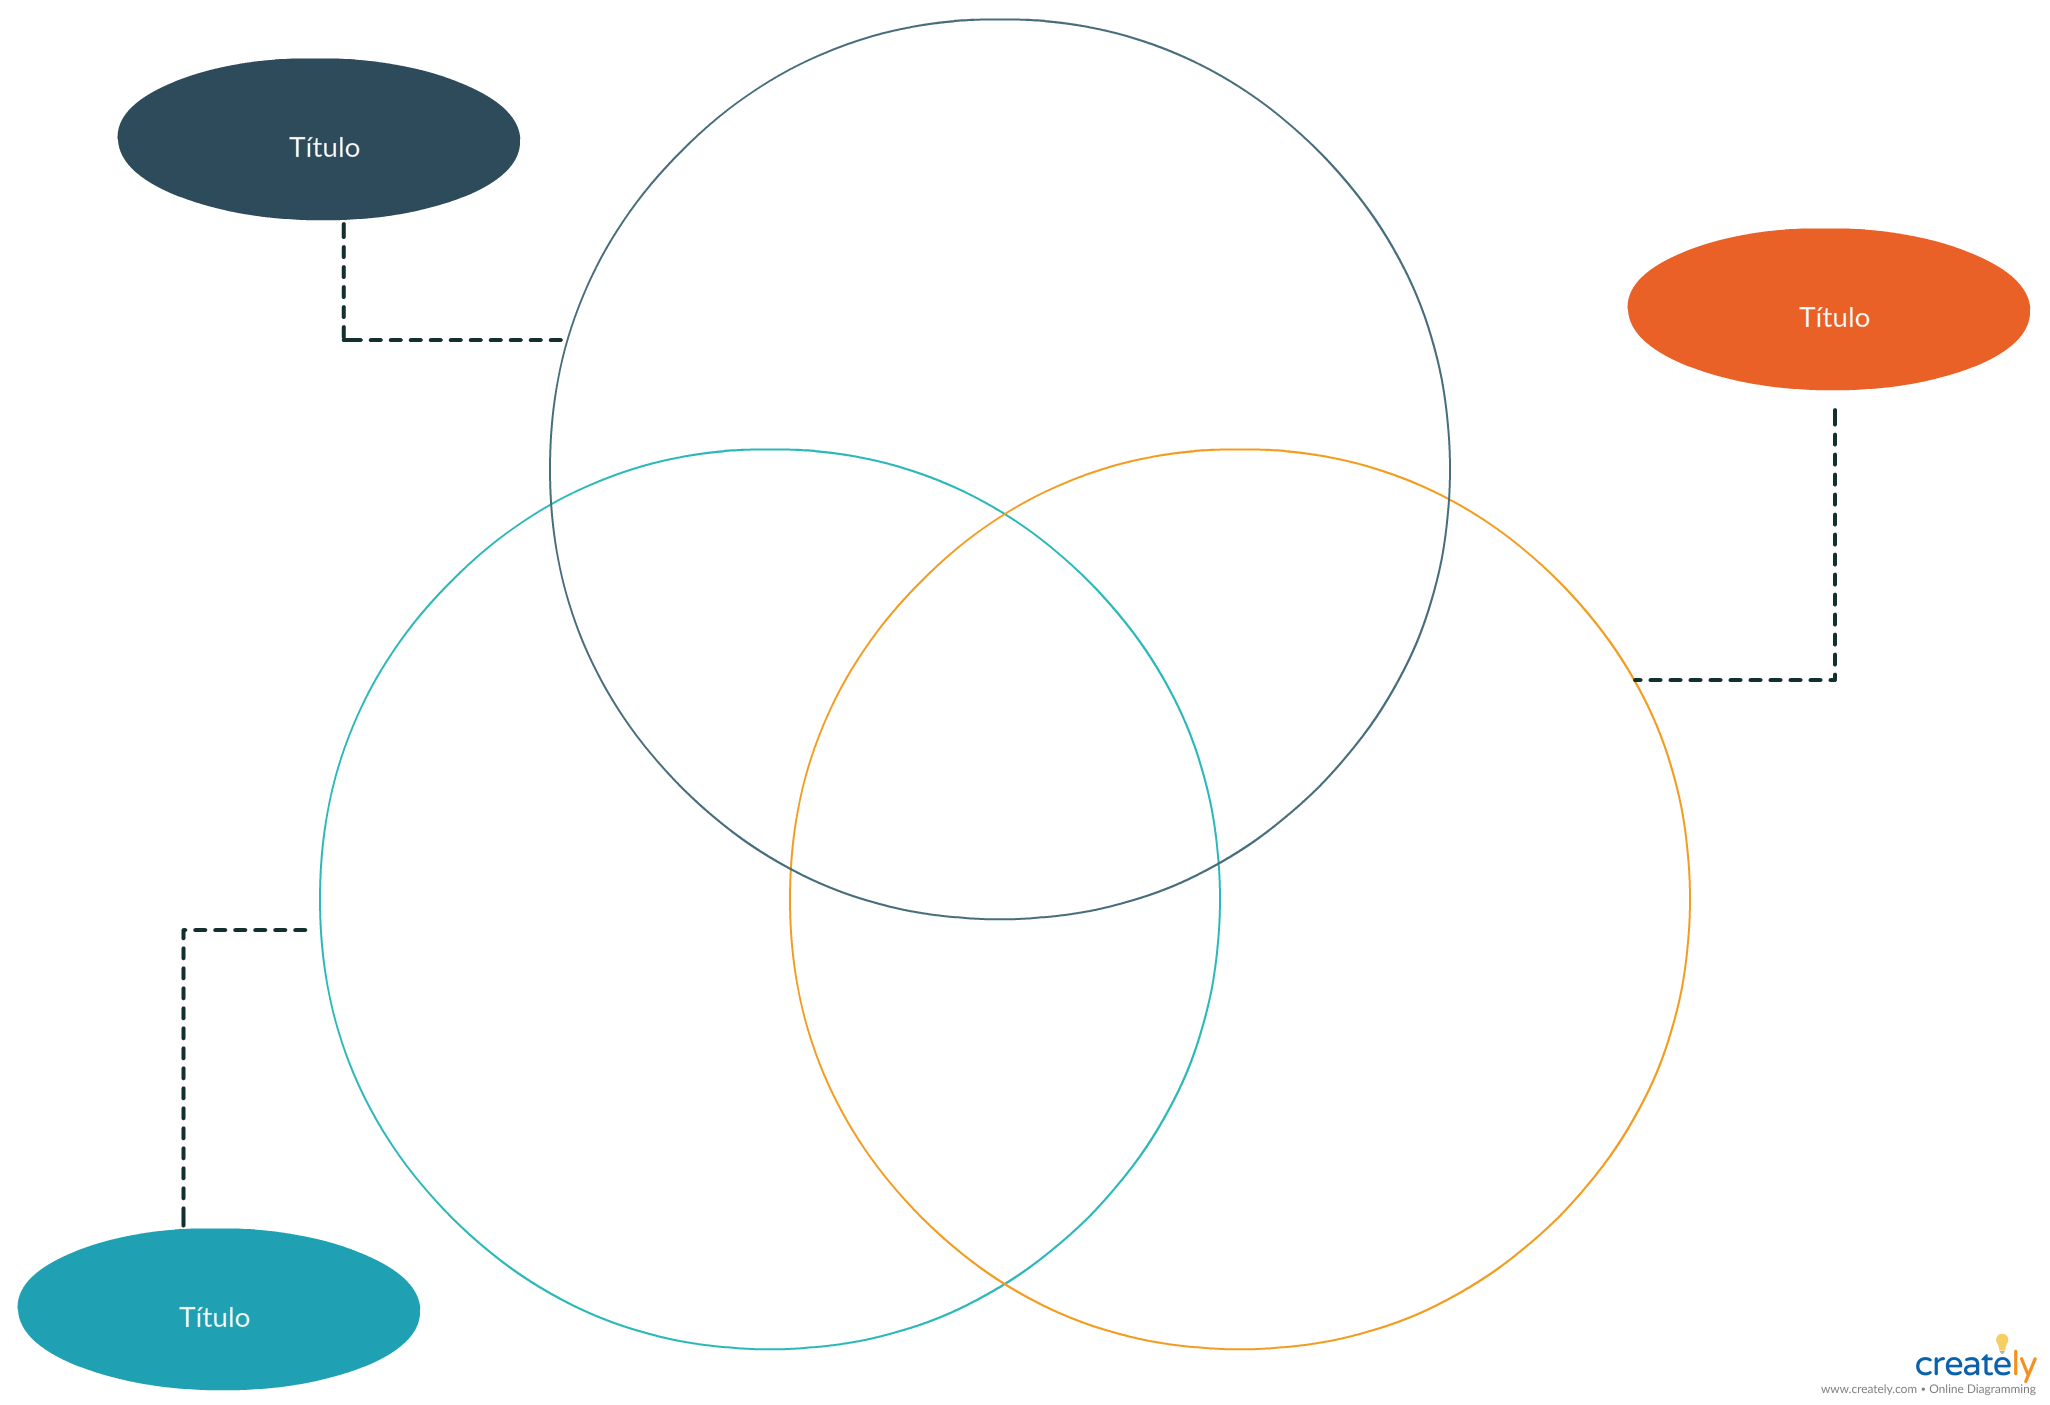 small resolution of 3 circulo diagrama de venn para descargar o modificar en linea puedes editar esta plantilla